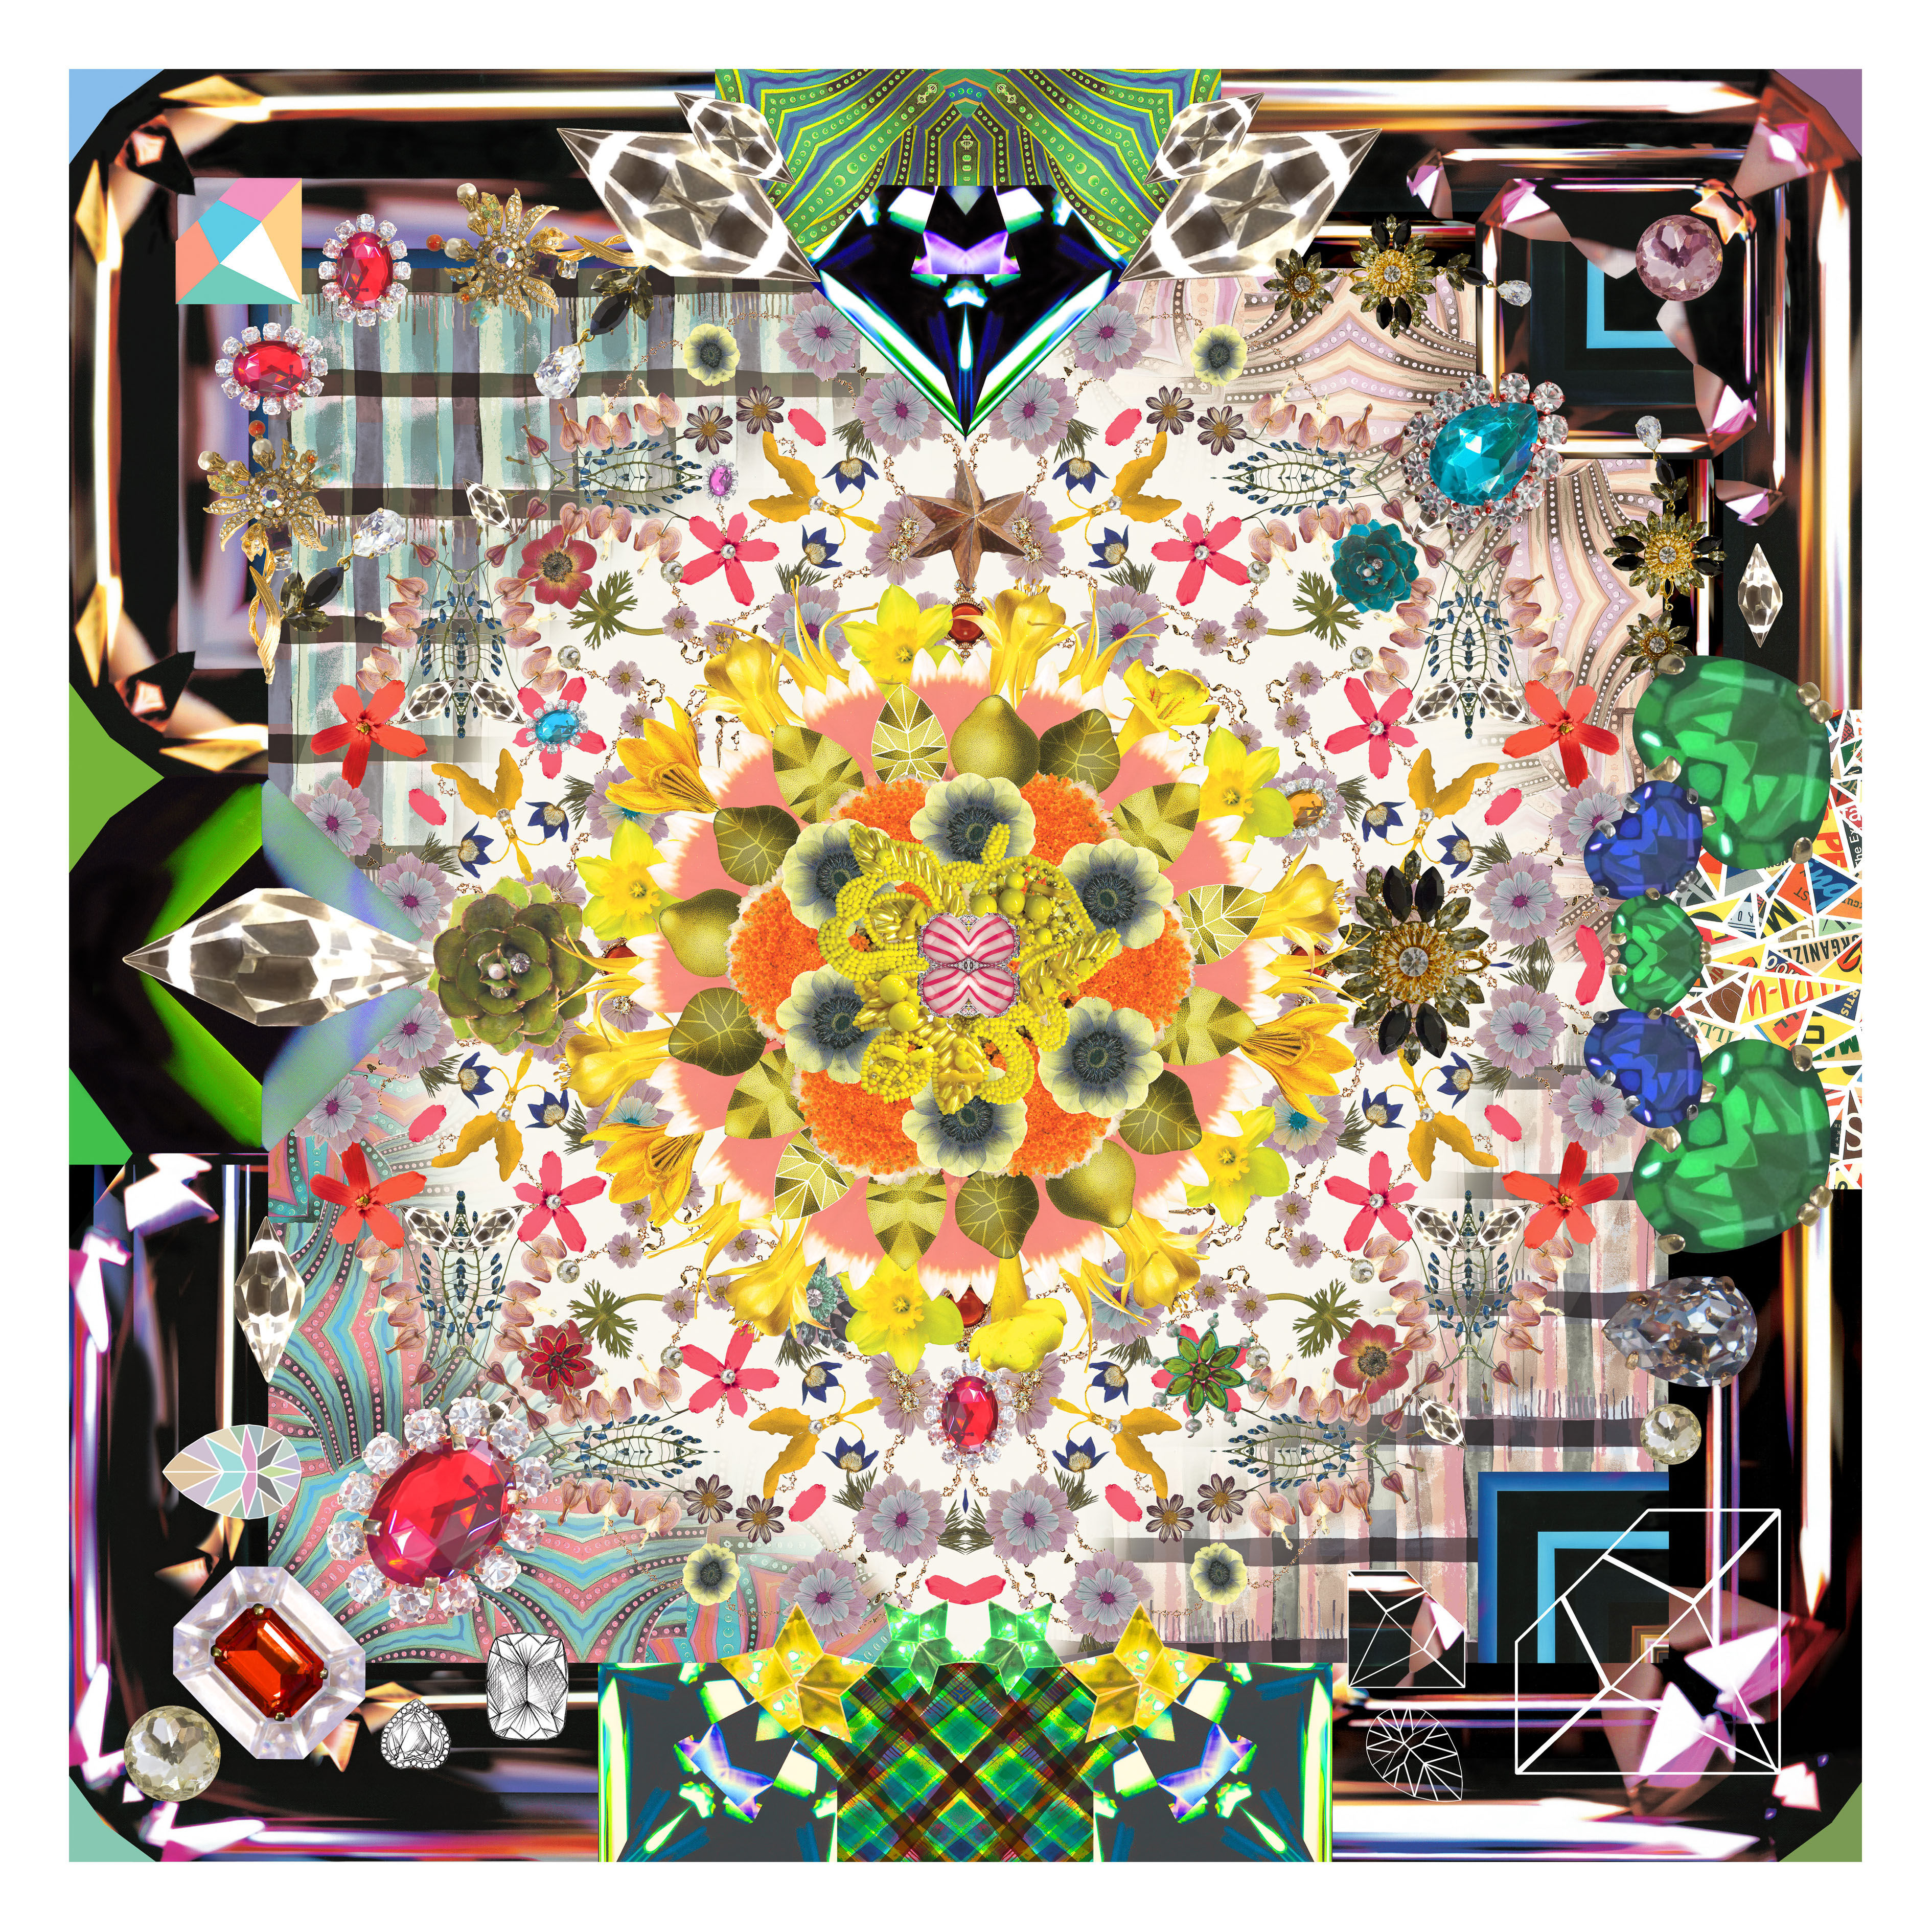 jewels garden 300 x 300 cm moooi carpets teppich. Black Bedroom Furniture Sets. Home Design Ideas